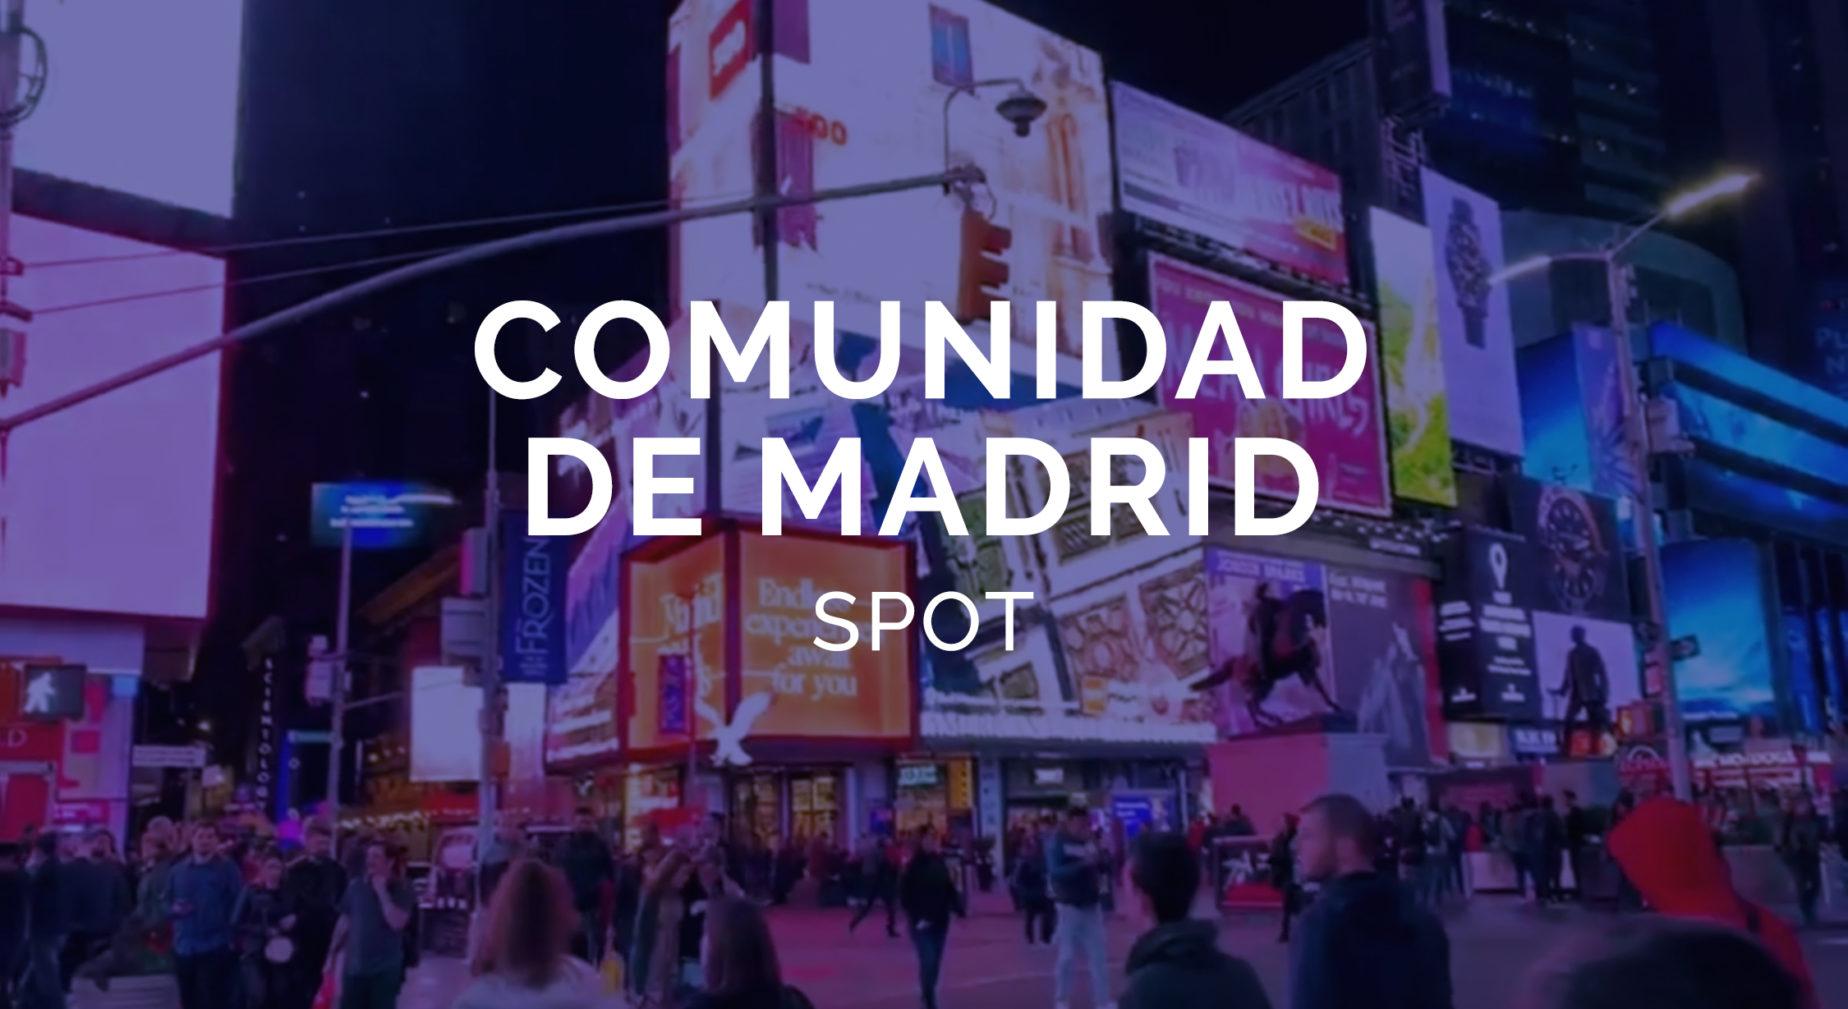 Times Square – Comunidad de Madrid